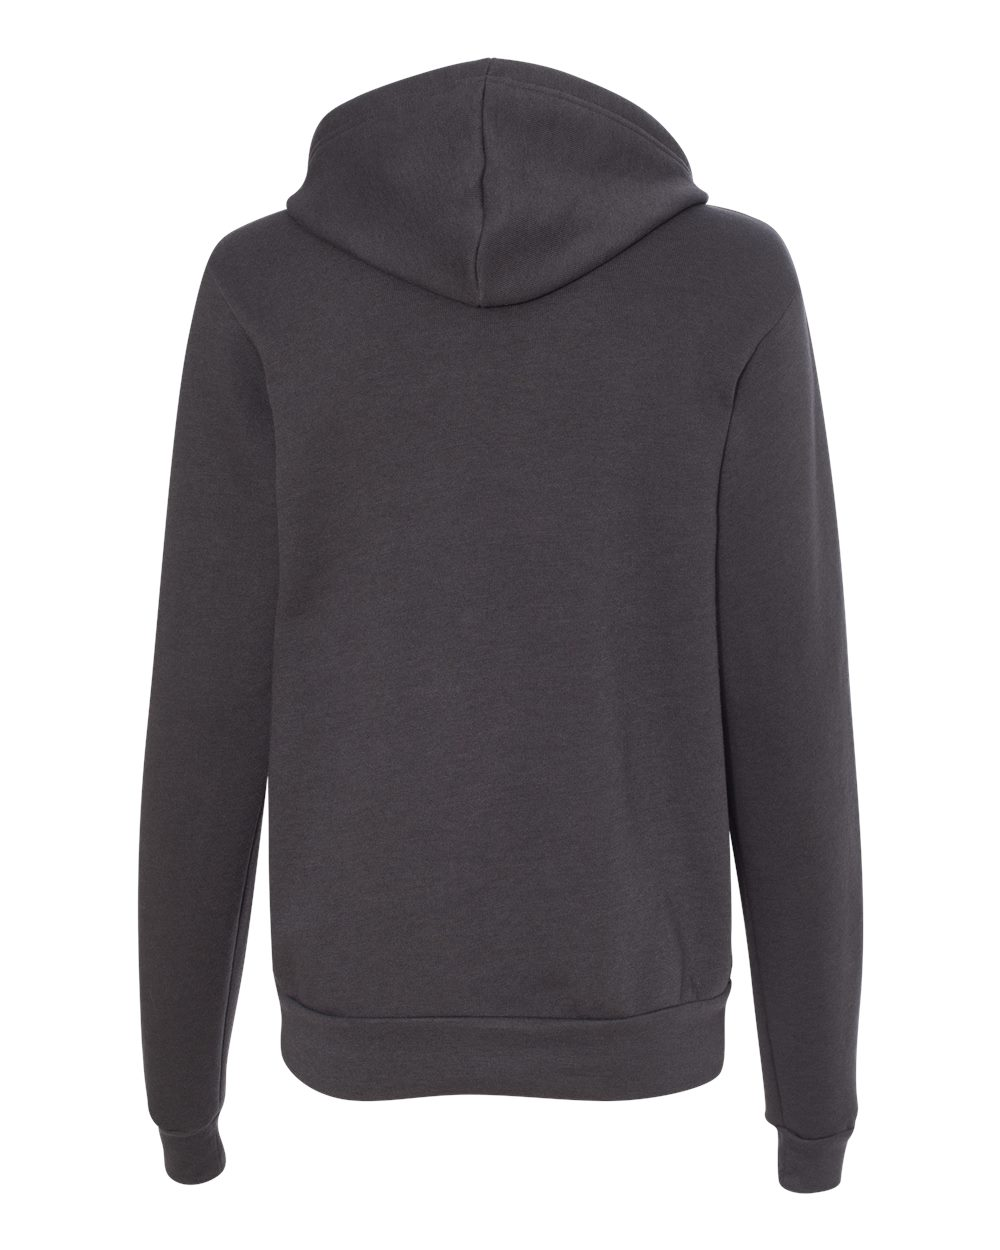 Bella-Canvas-Unisex-Sponge-Hooded-Pullover-Sweatshirt-Blank-3719-up-to-2XL thumbnail 17